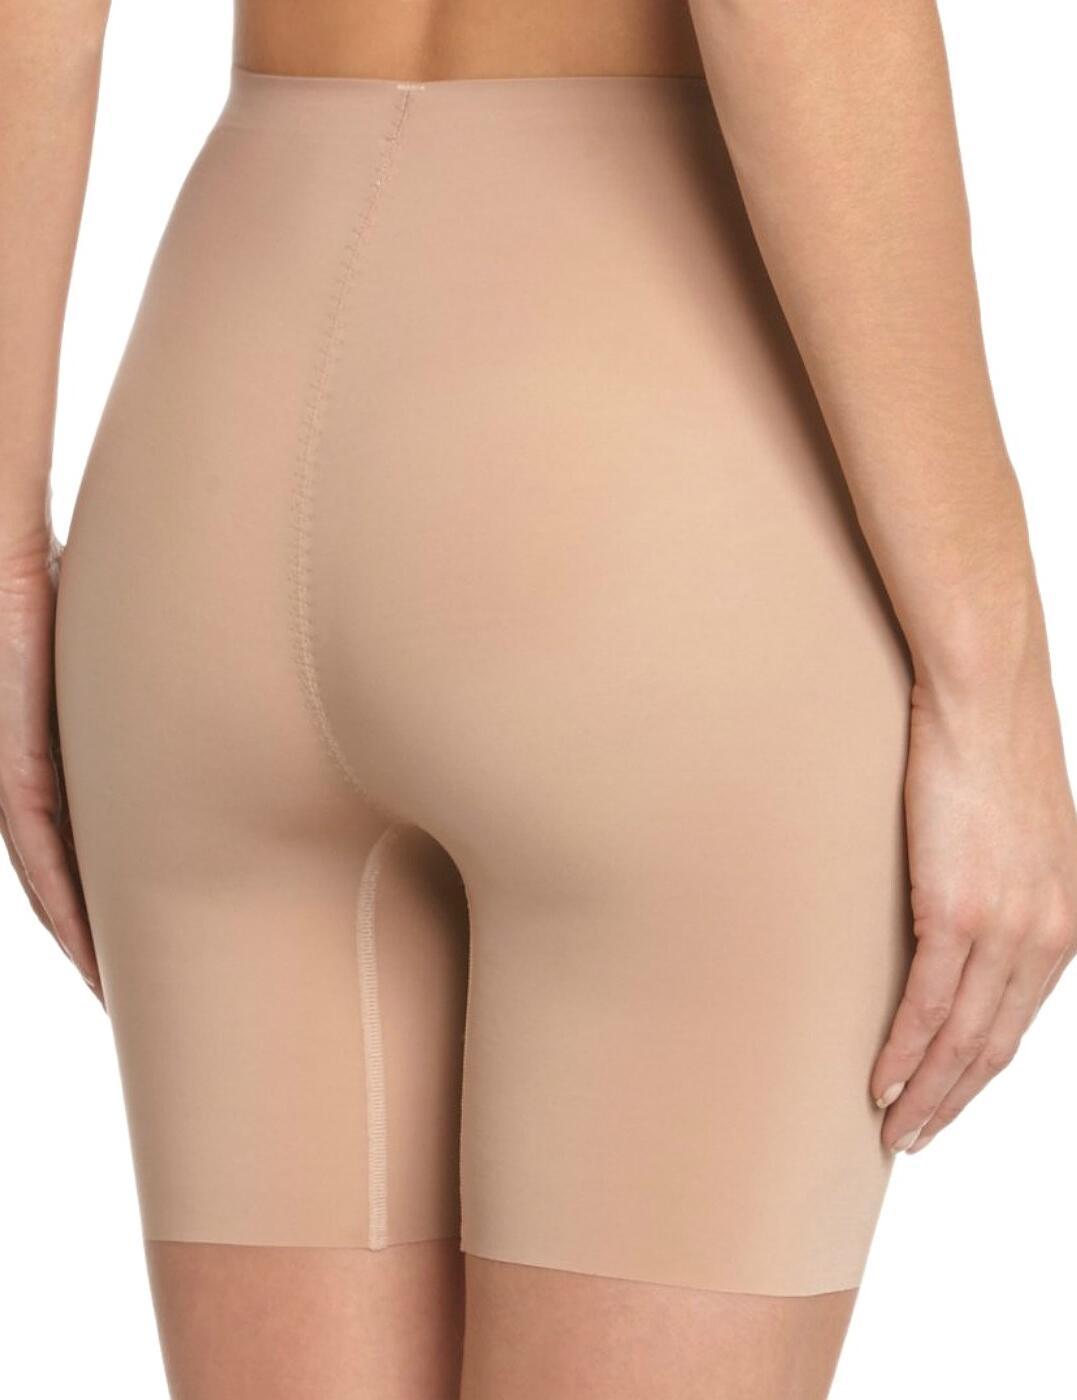 Wacoal-Beauty-Secret-Lift-Up-Shaping-Slimming-Panty-GRA541-Wacoal-Shapewear Indexbild 9